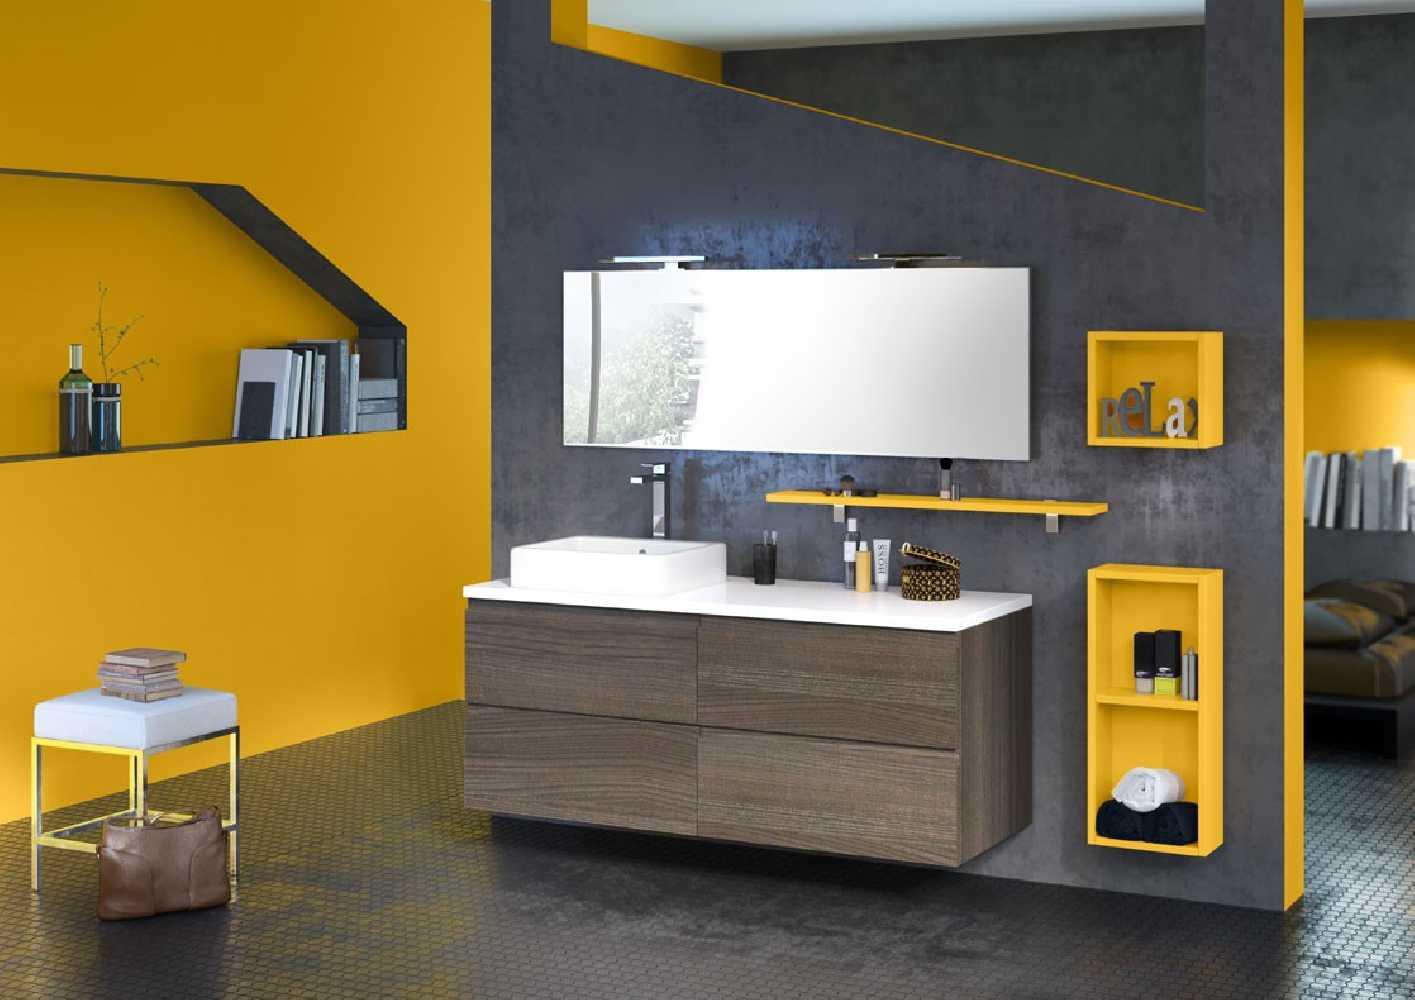 Ambiance meuble Loft Discac